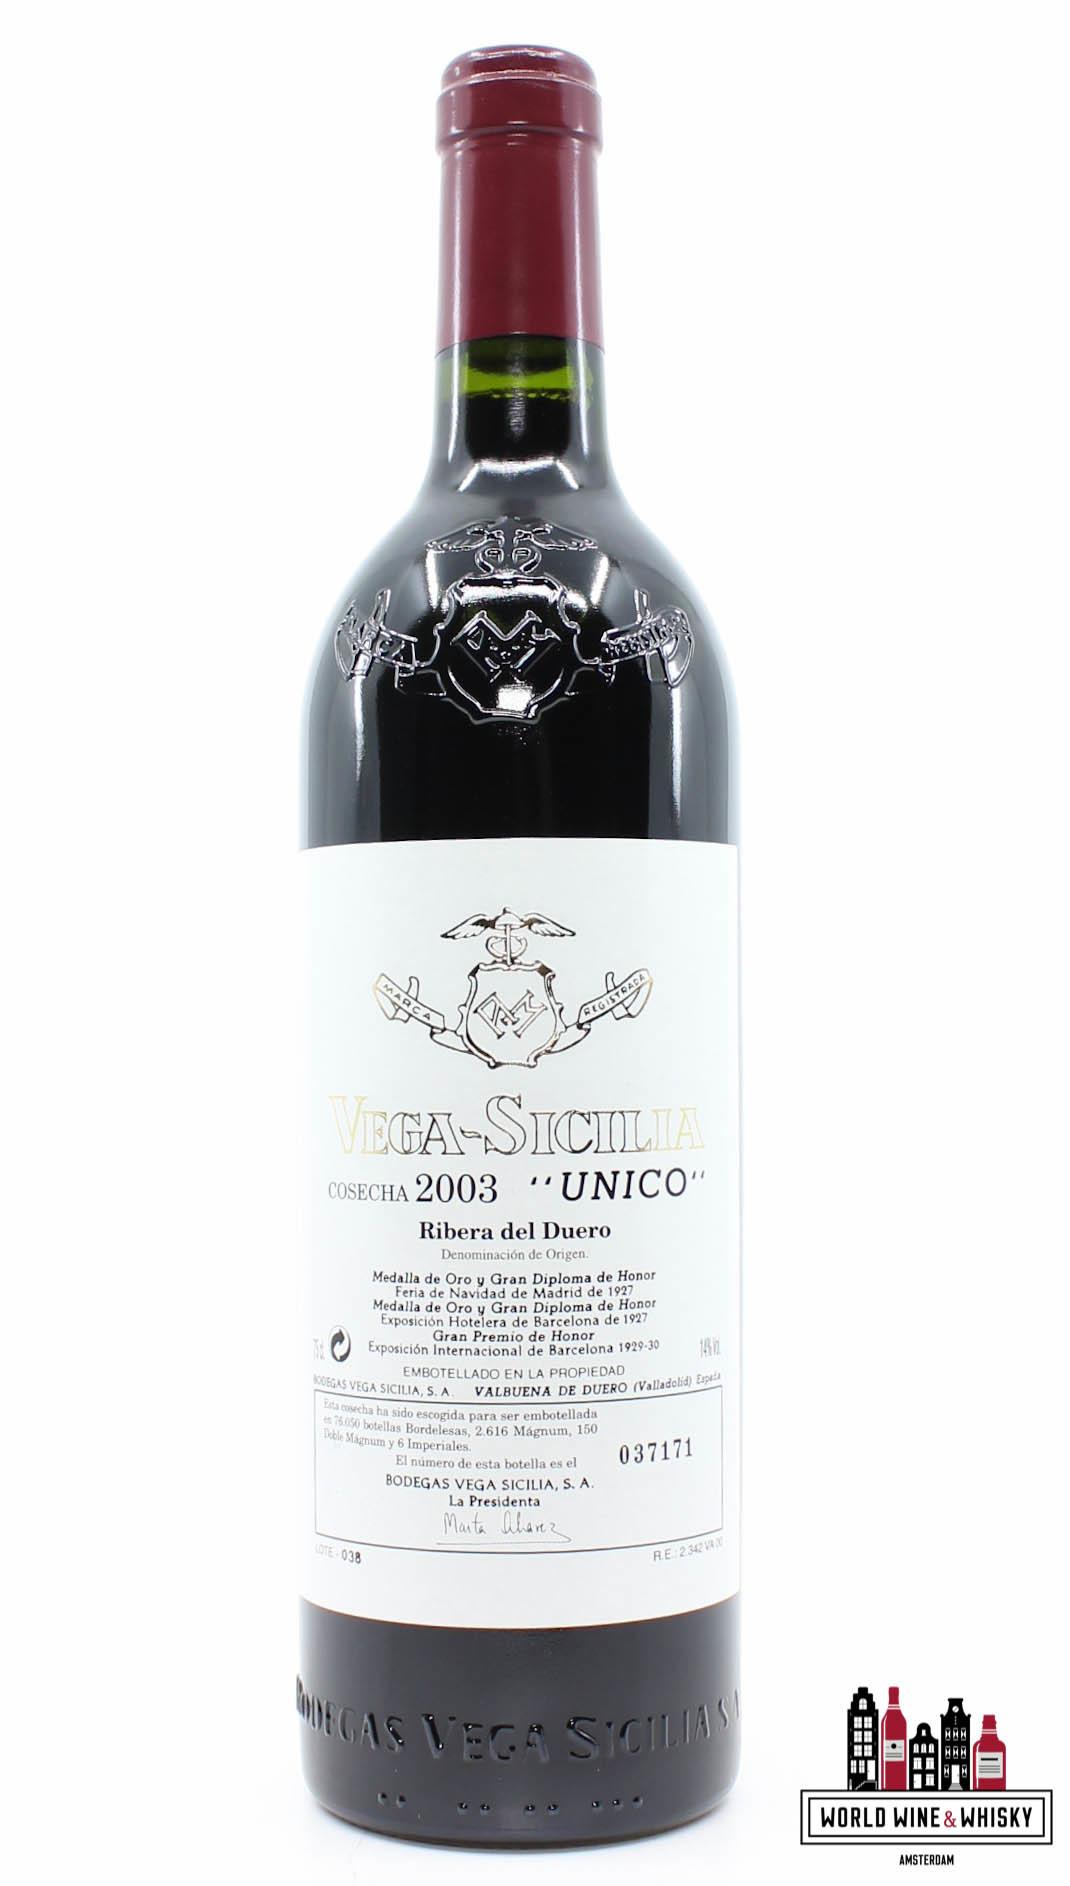 Vega Sicilia Unico Ribera Del Duero 2003 In The 3 Bottles Owc World Wine Whisky